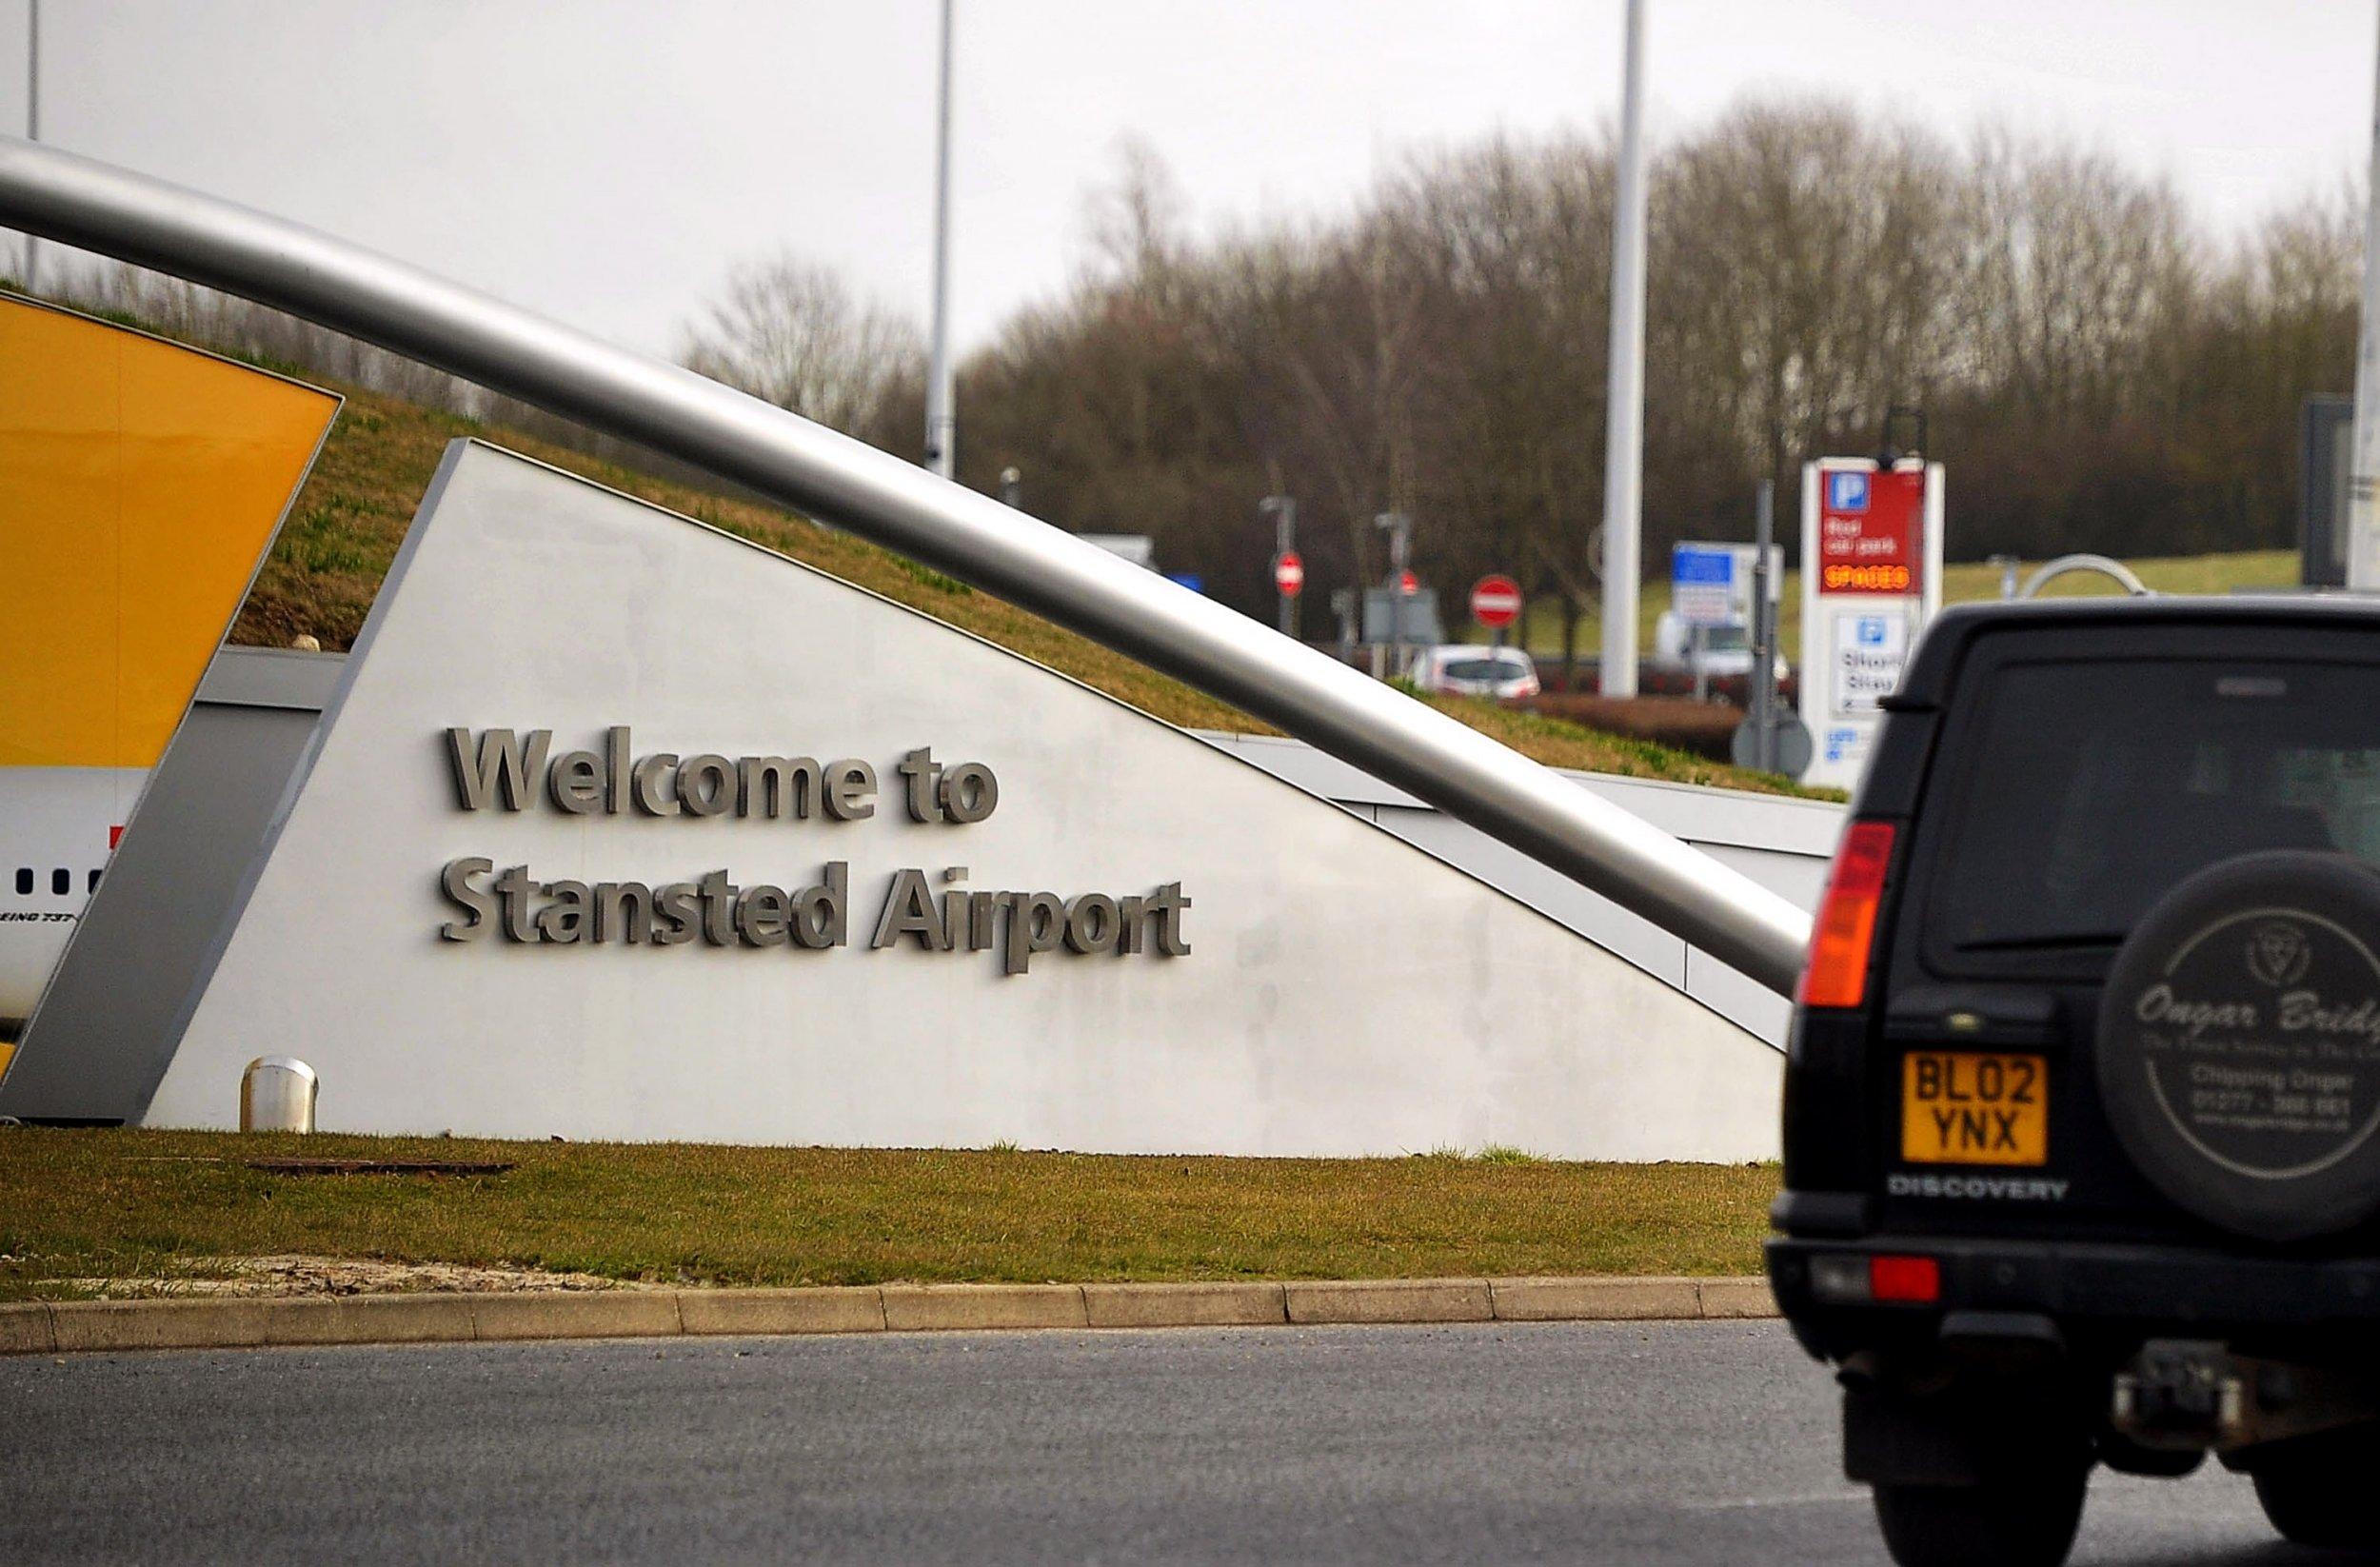 stansted 15, activists deportation flight